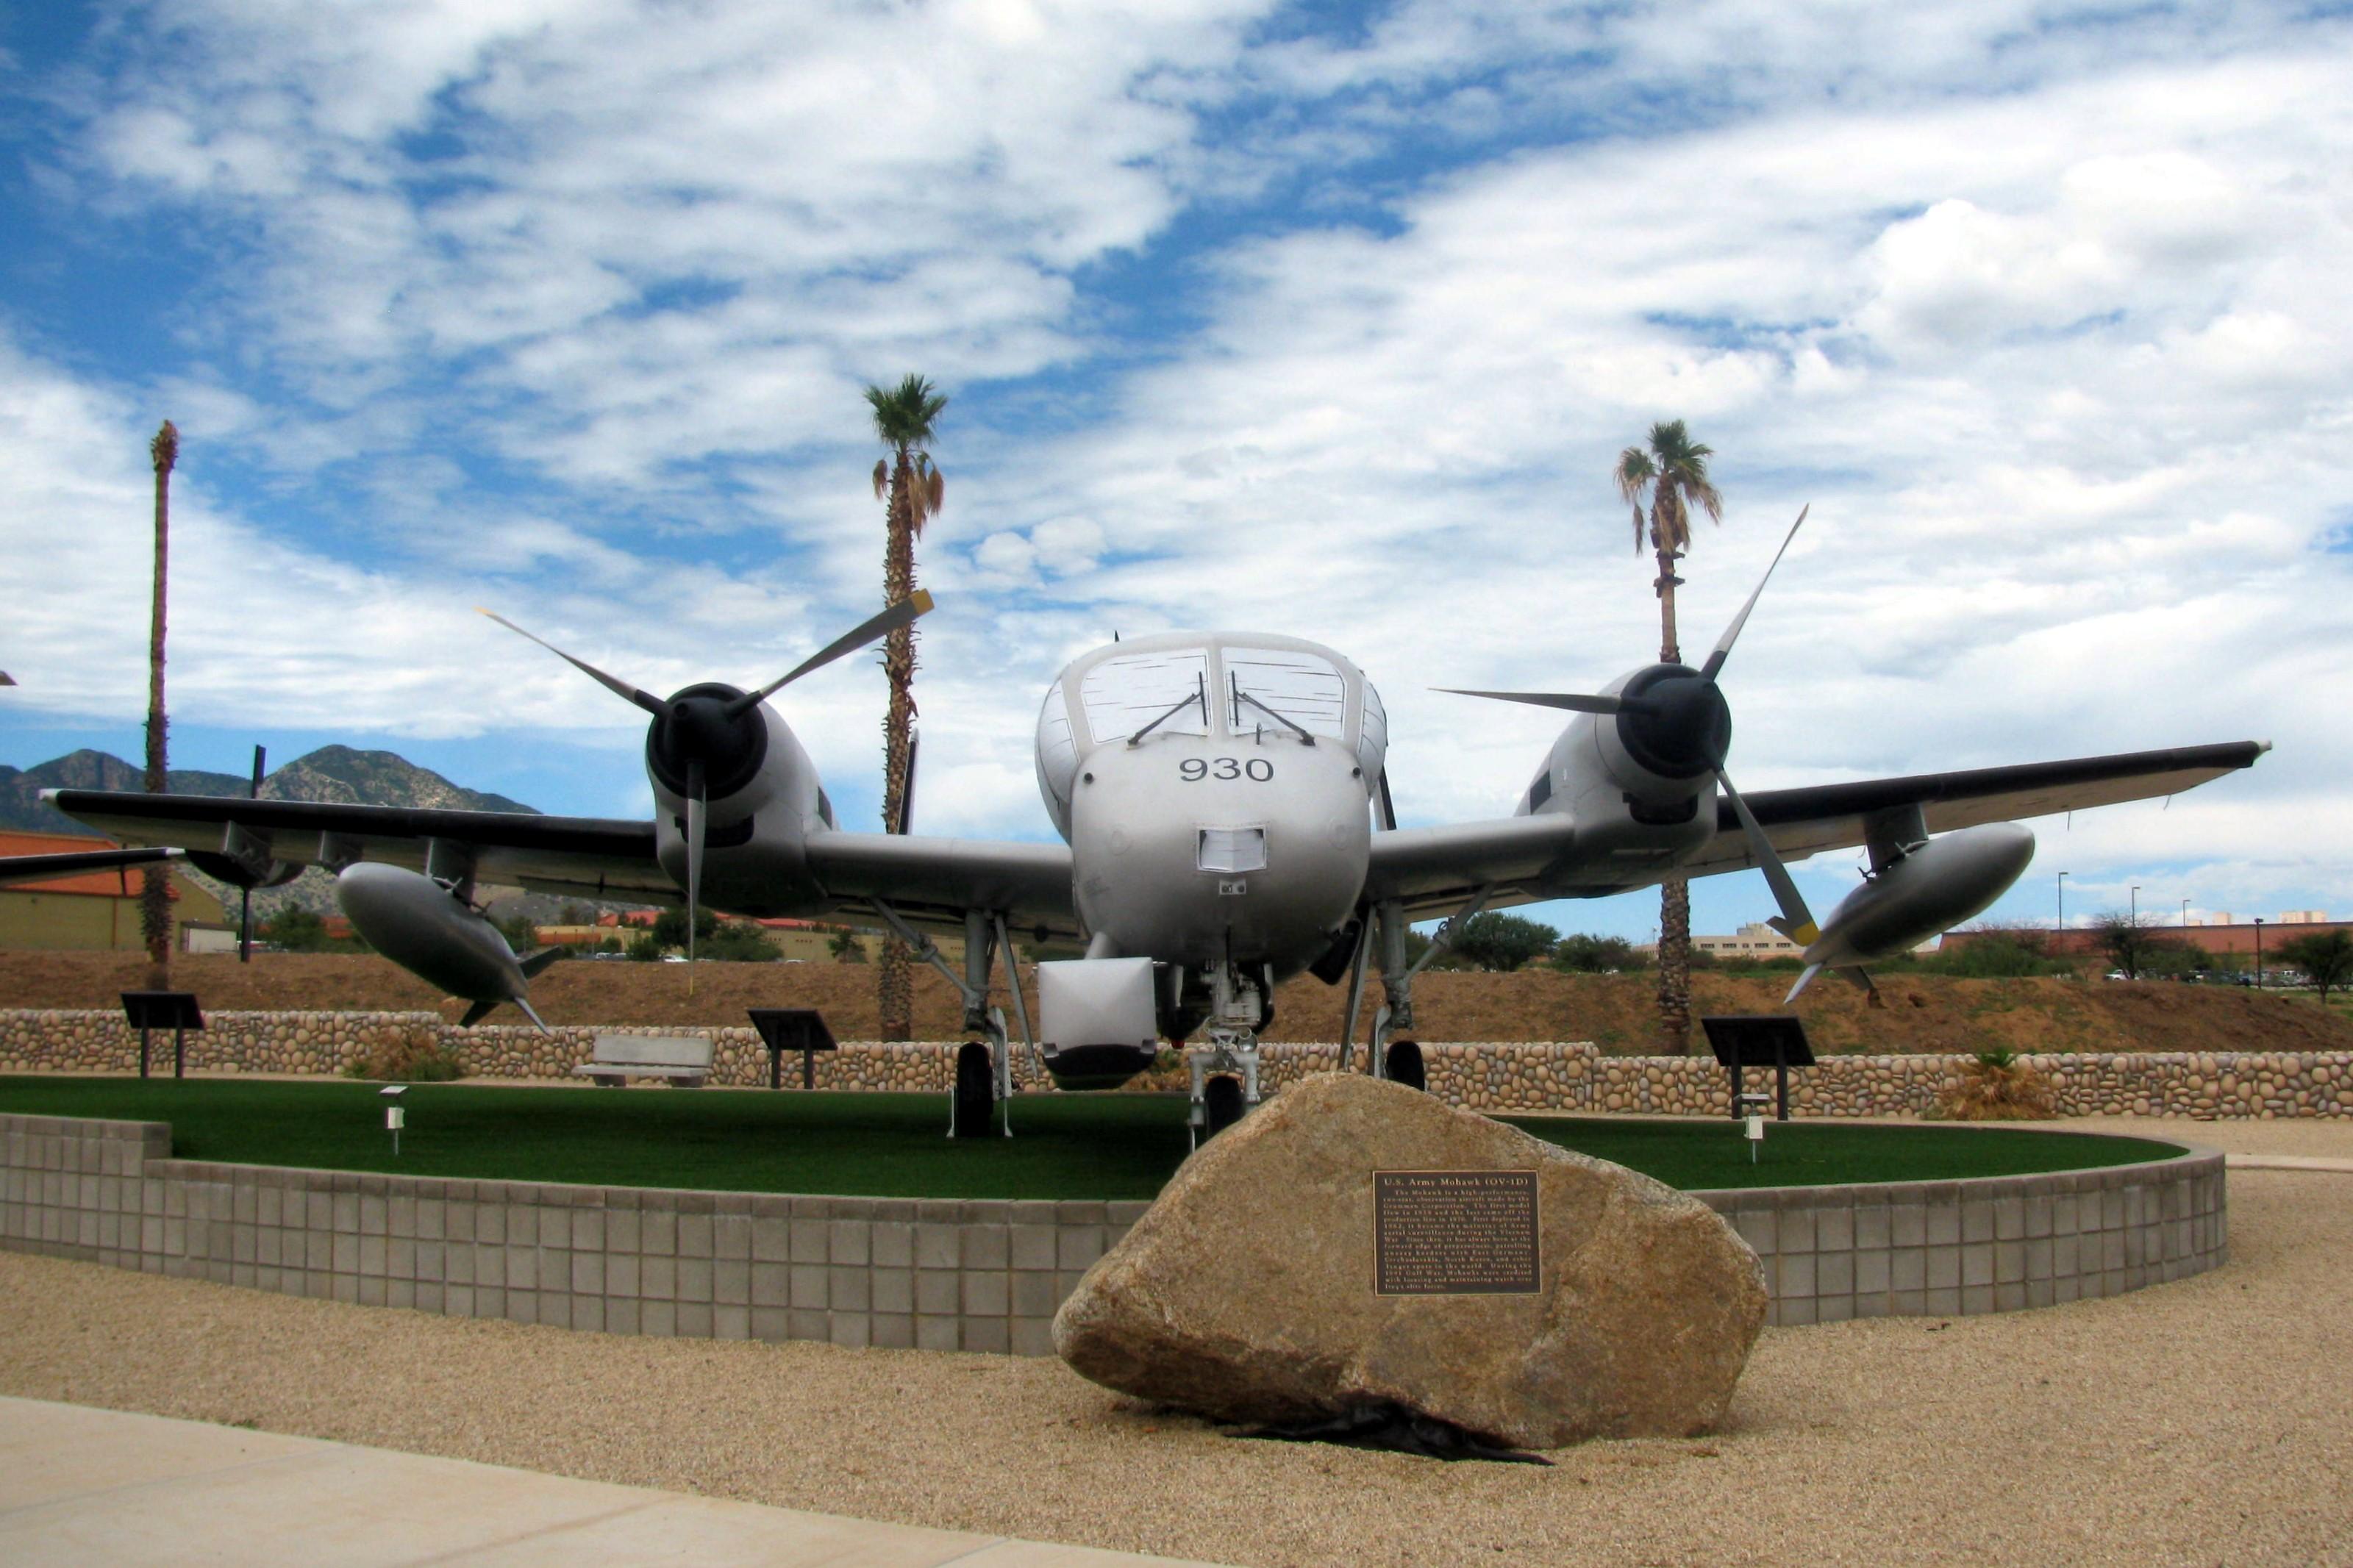 arizona aviation museum guide fort huachuca